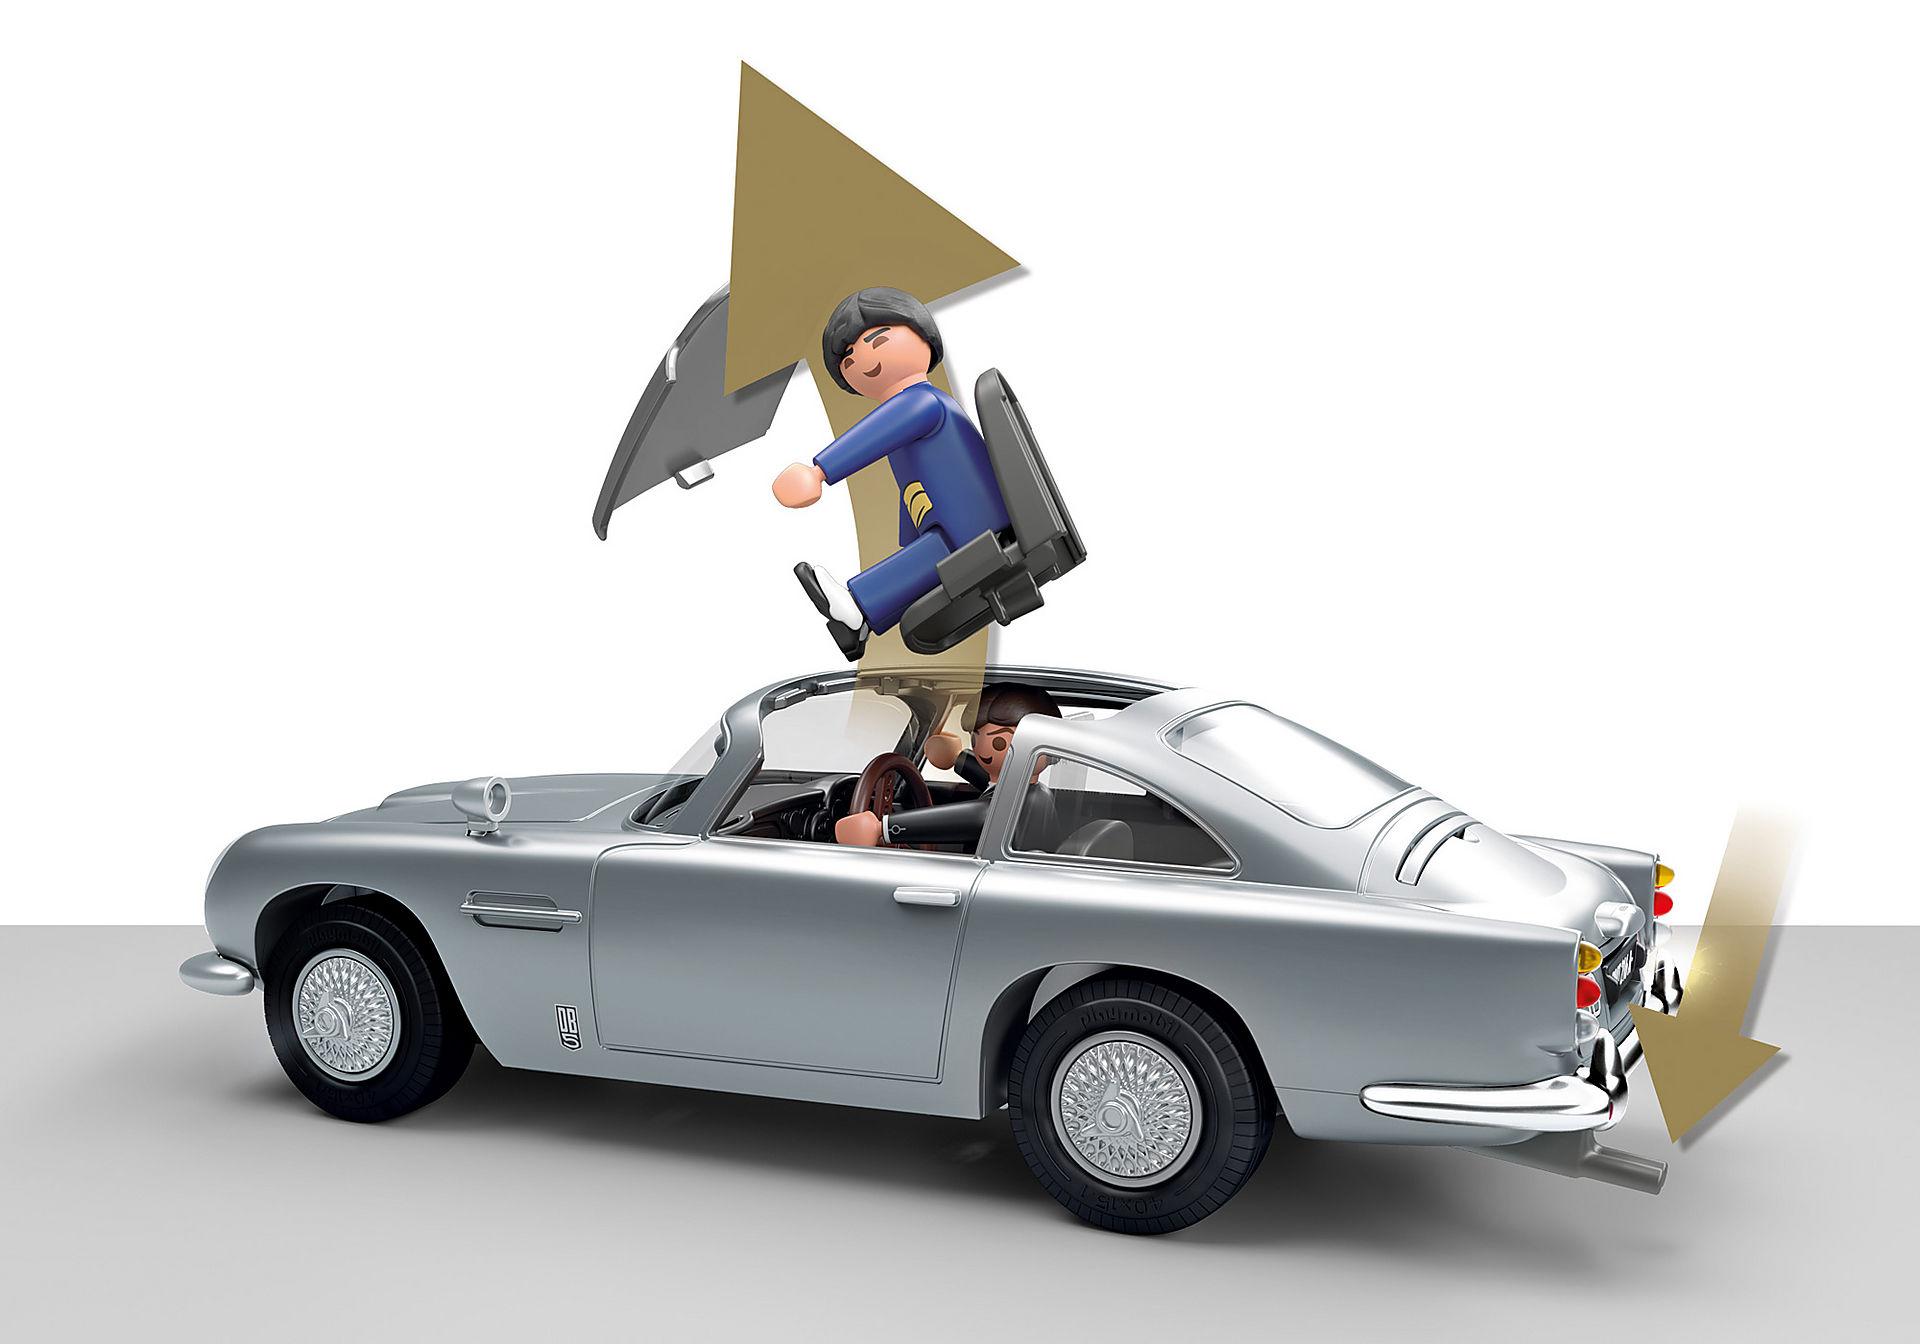 70578 James Bond Aston Martin DB5 - Goldfinger Edition zoom image6